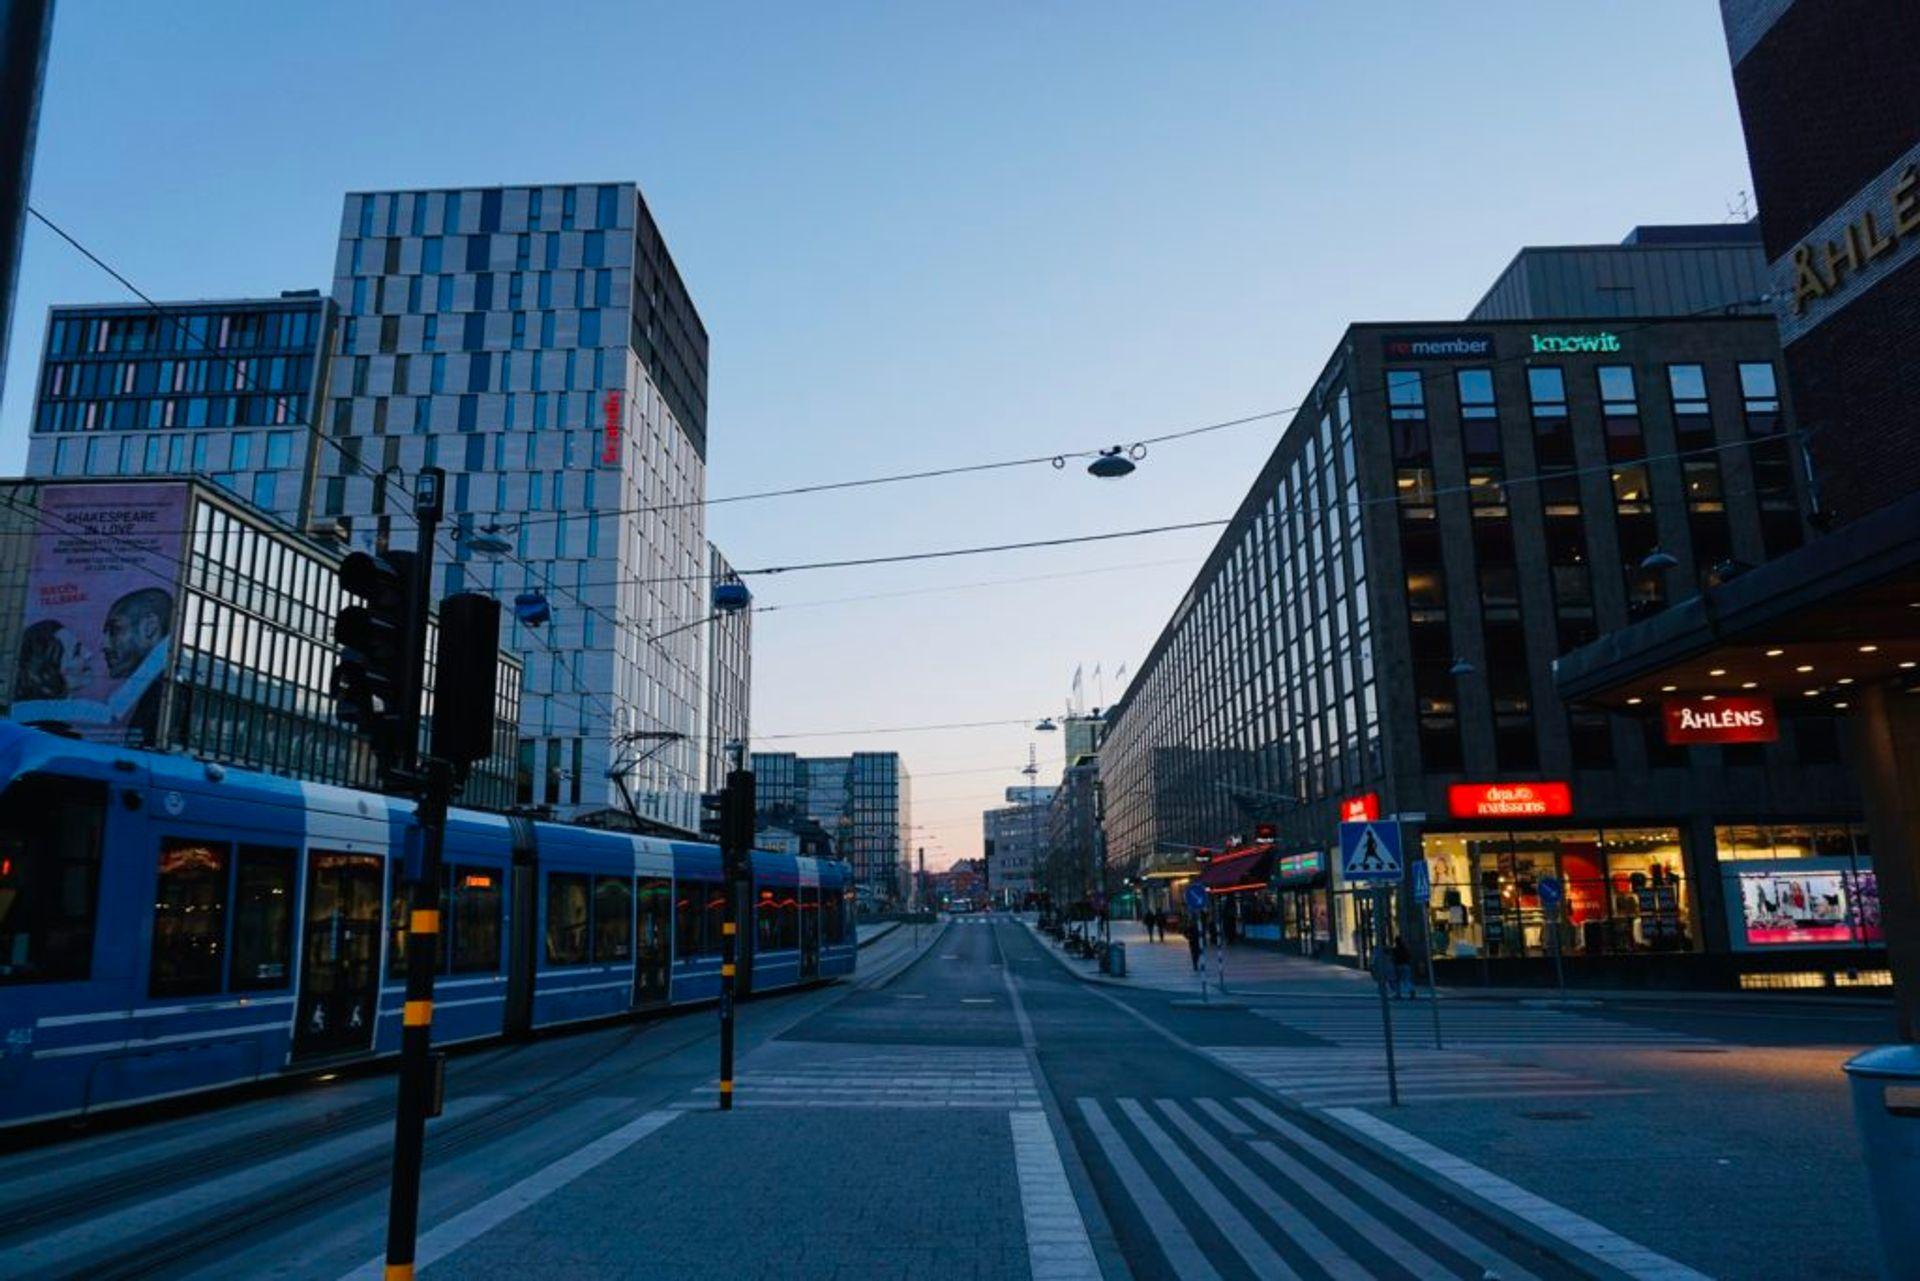 A tram on an empty street.